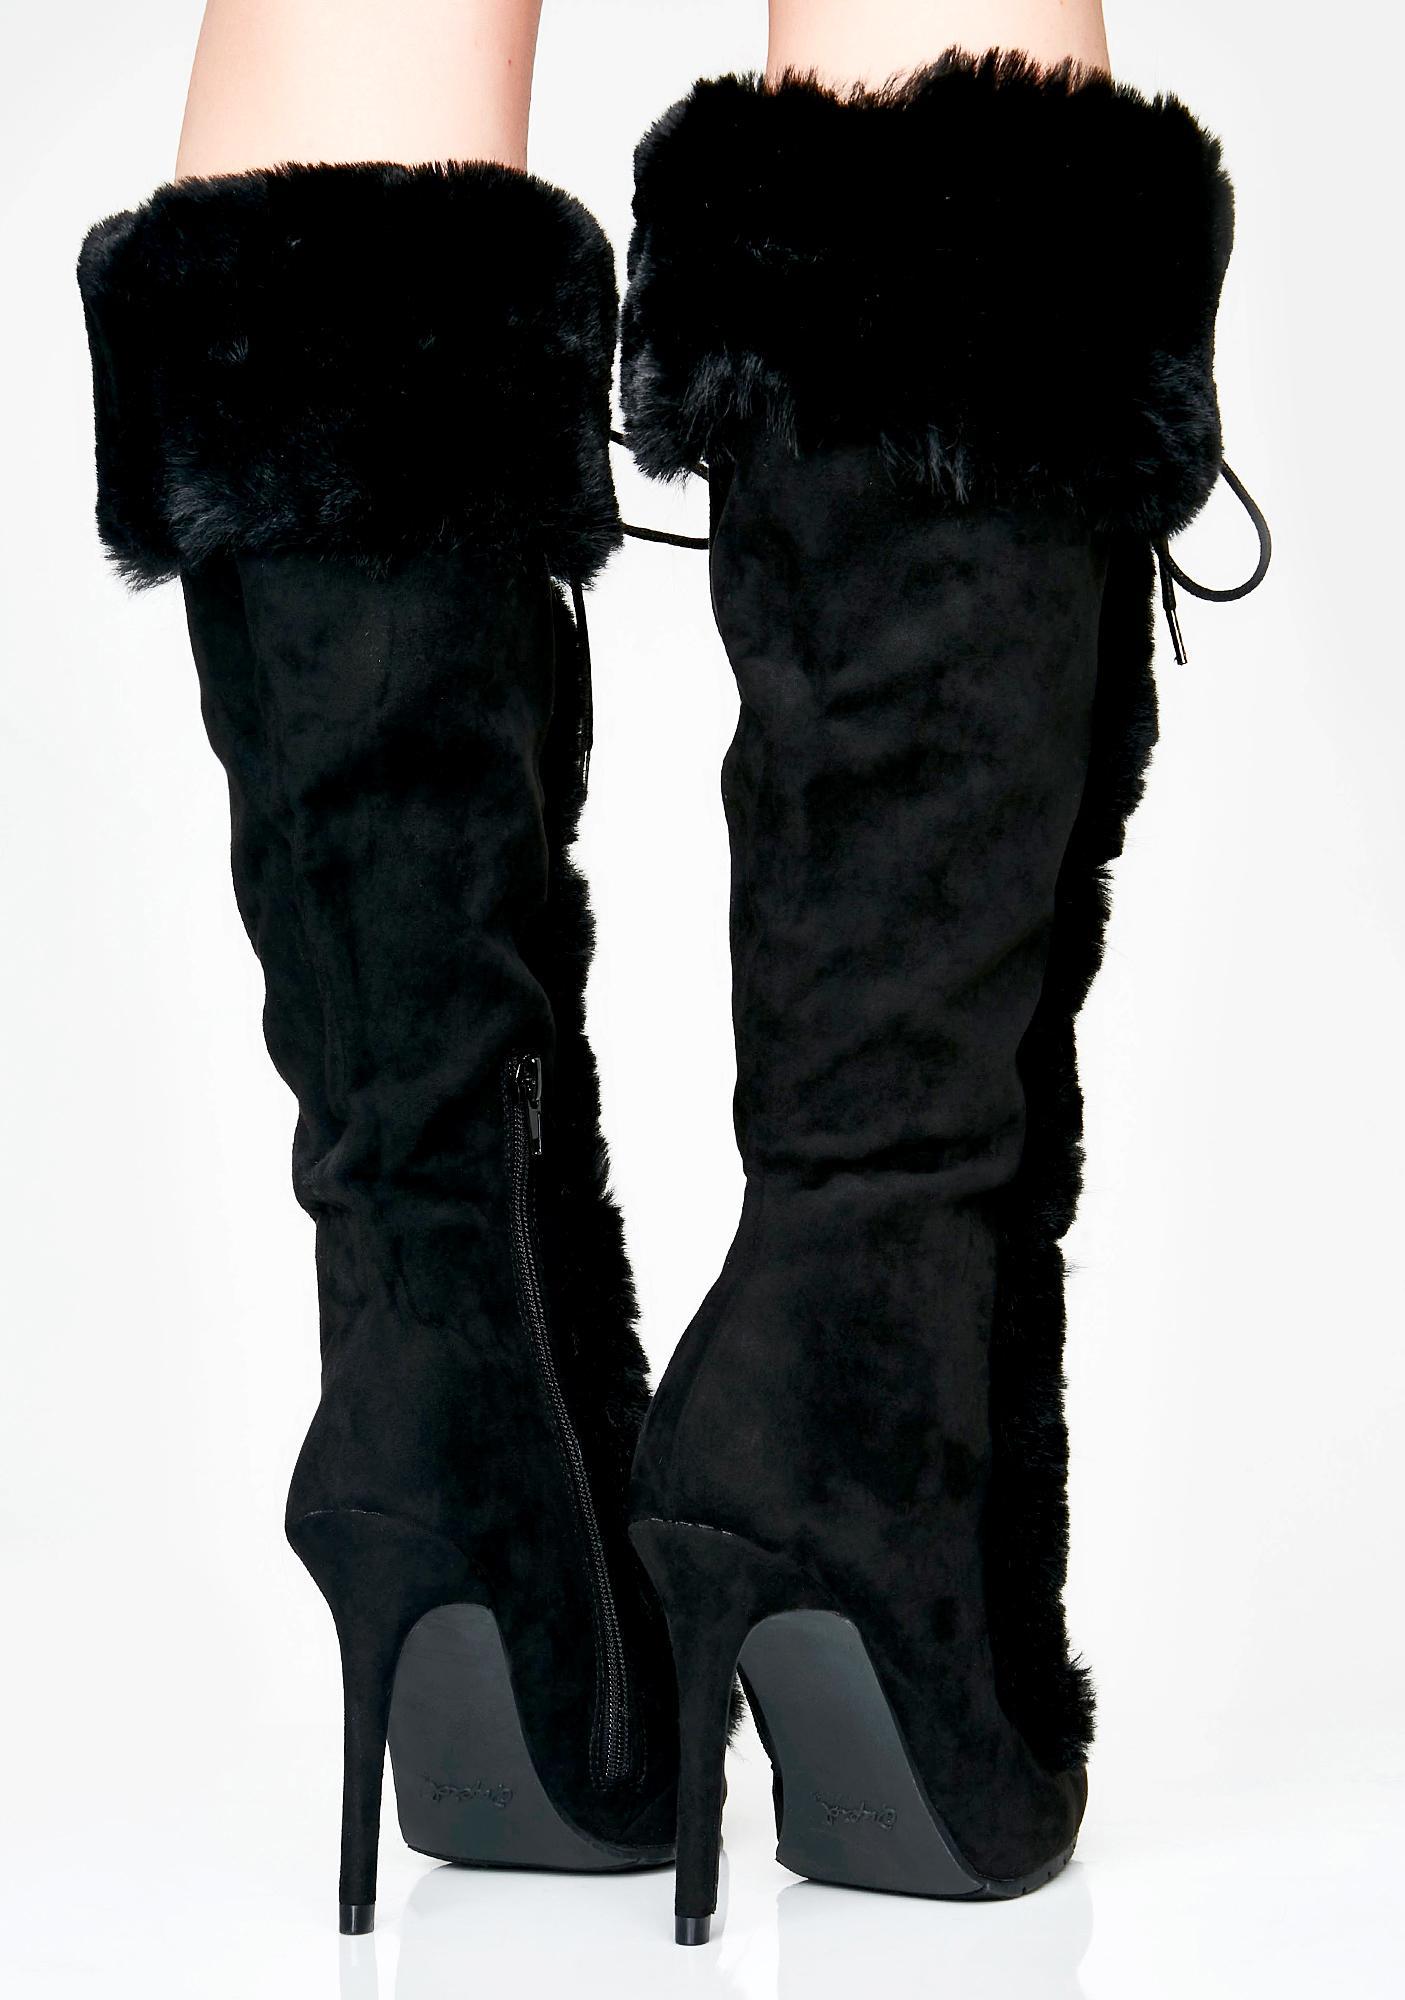 Overnight Sensation Furry Boots